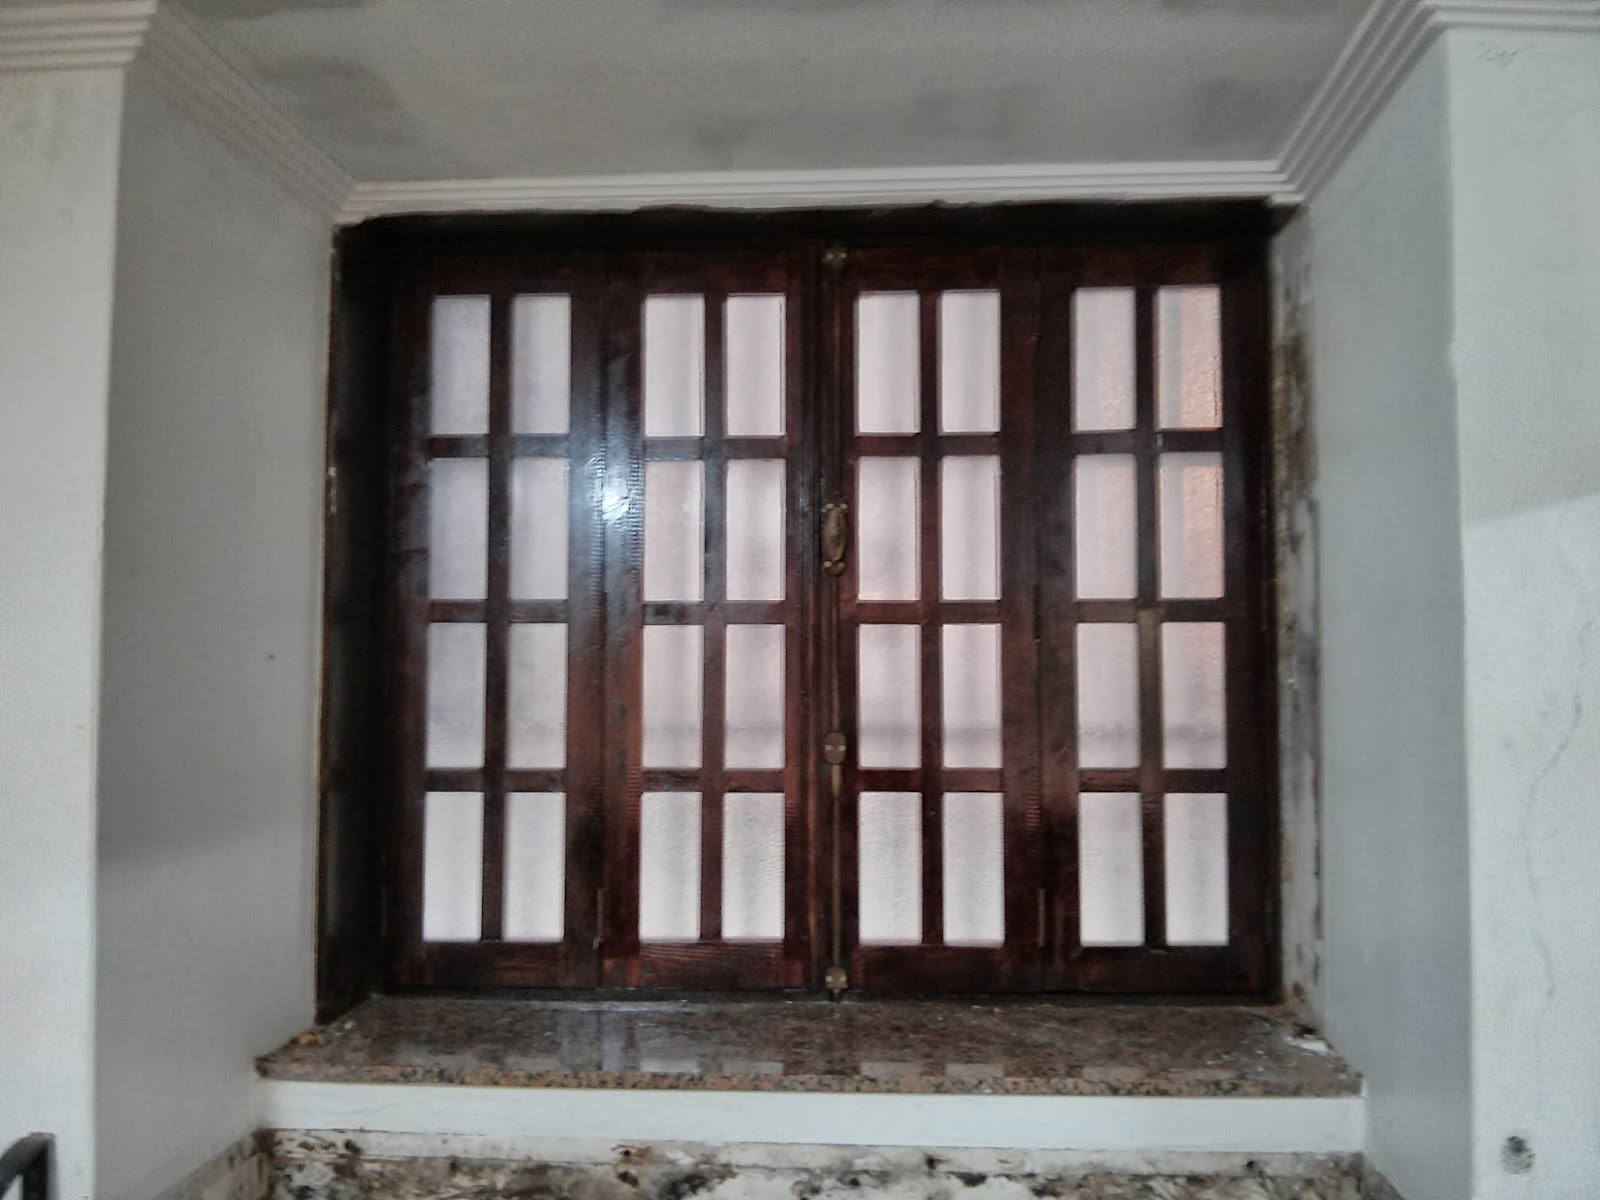 Cmo construir ventanas de madera Bricolaje